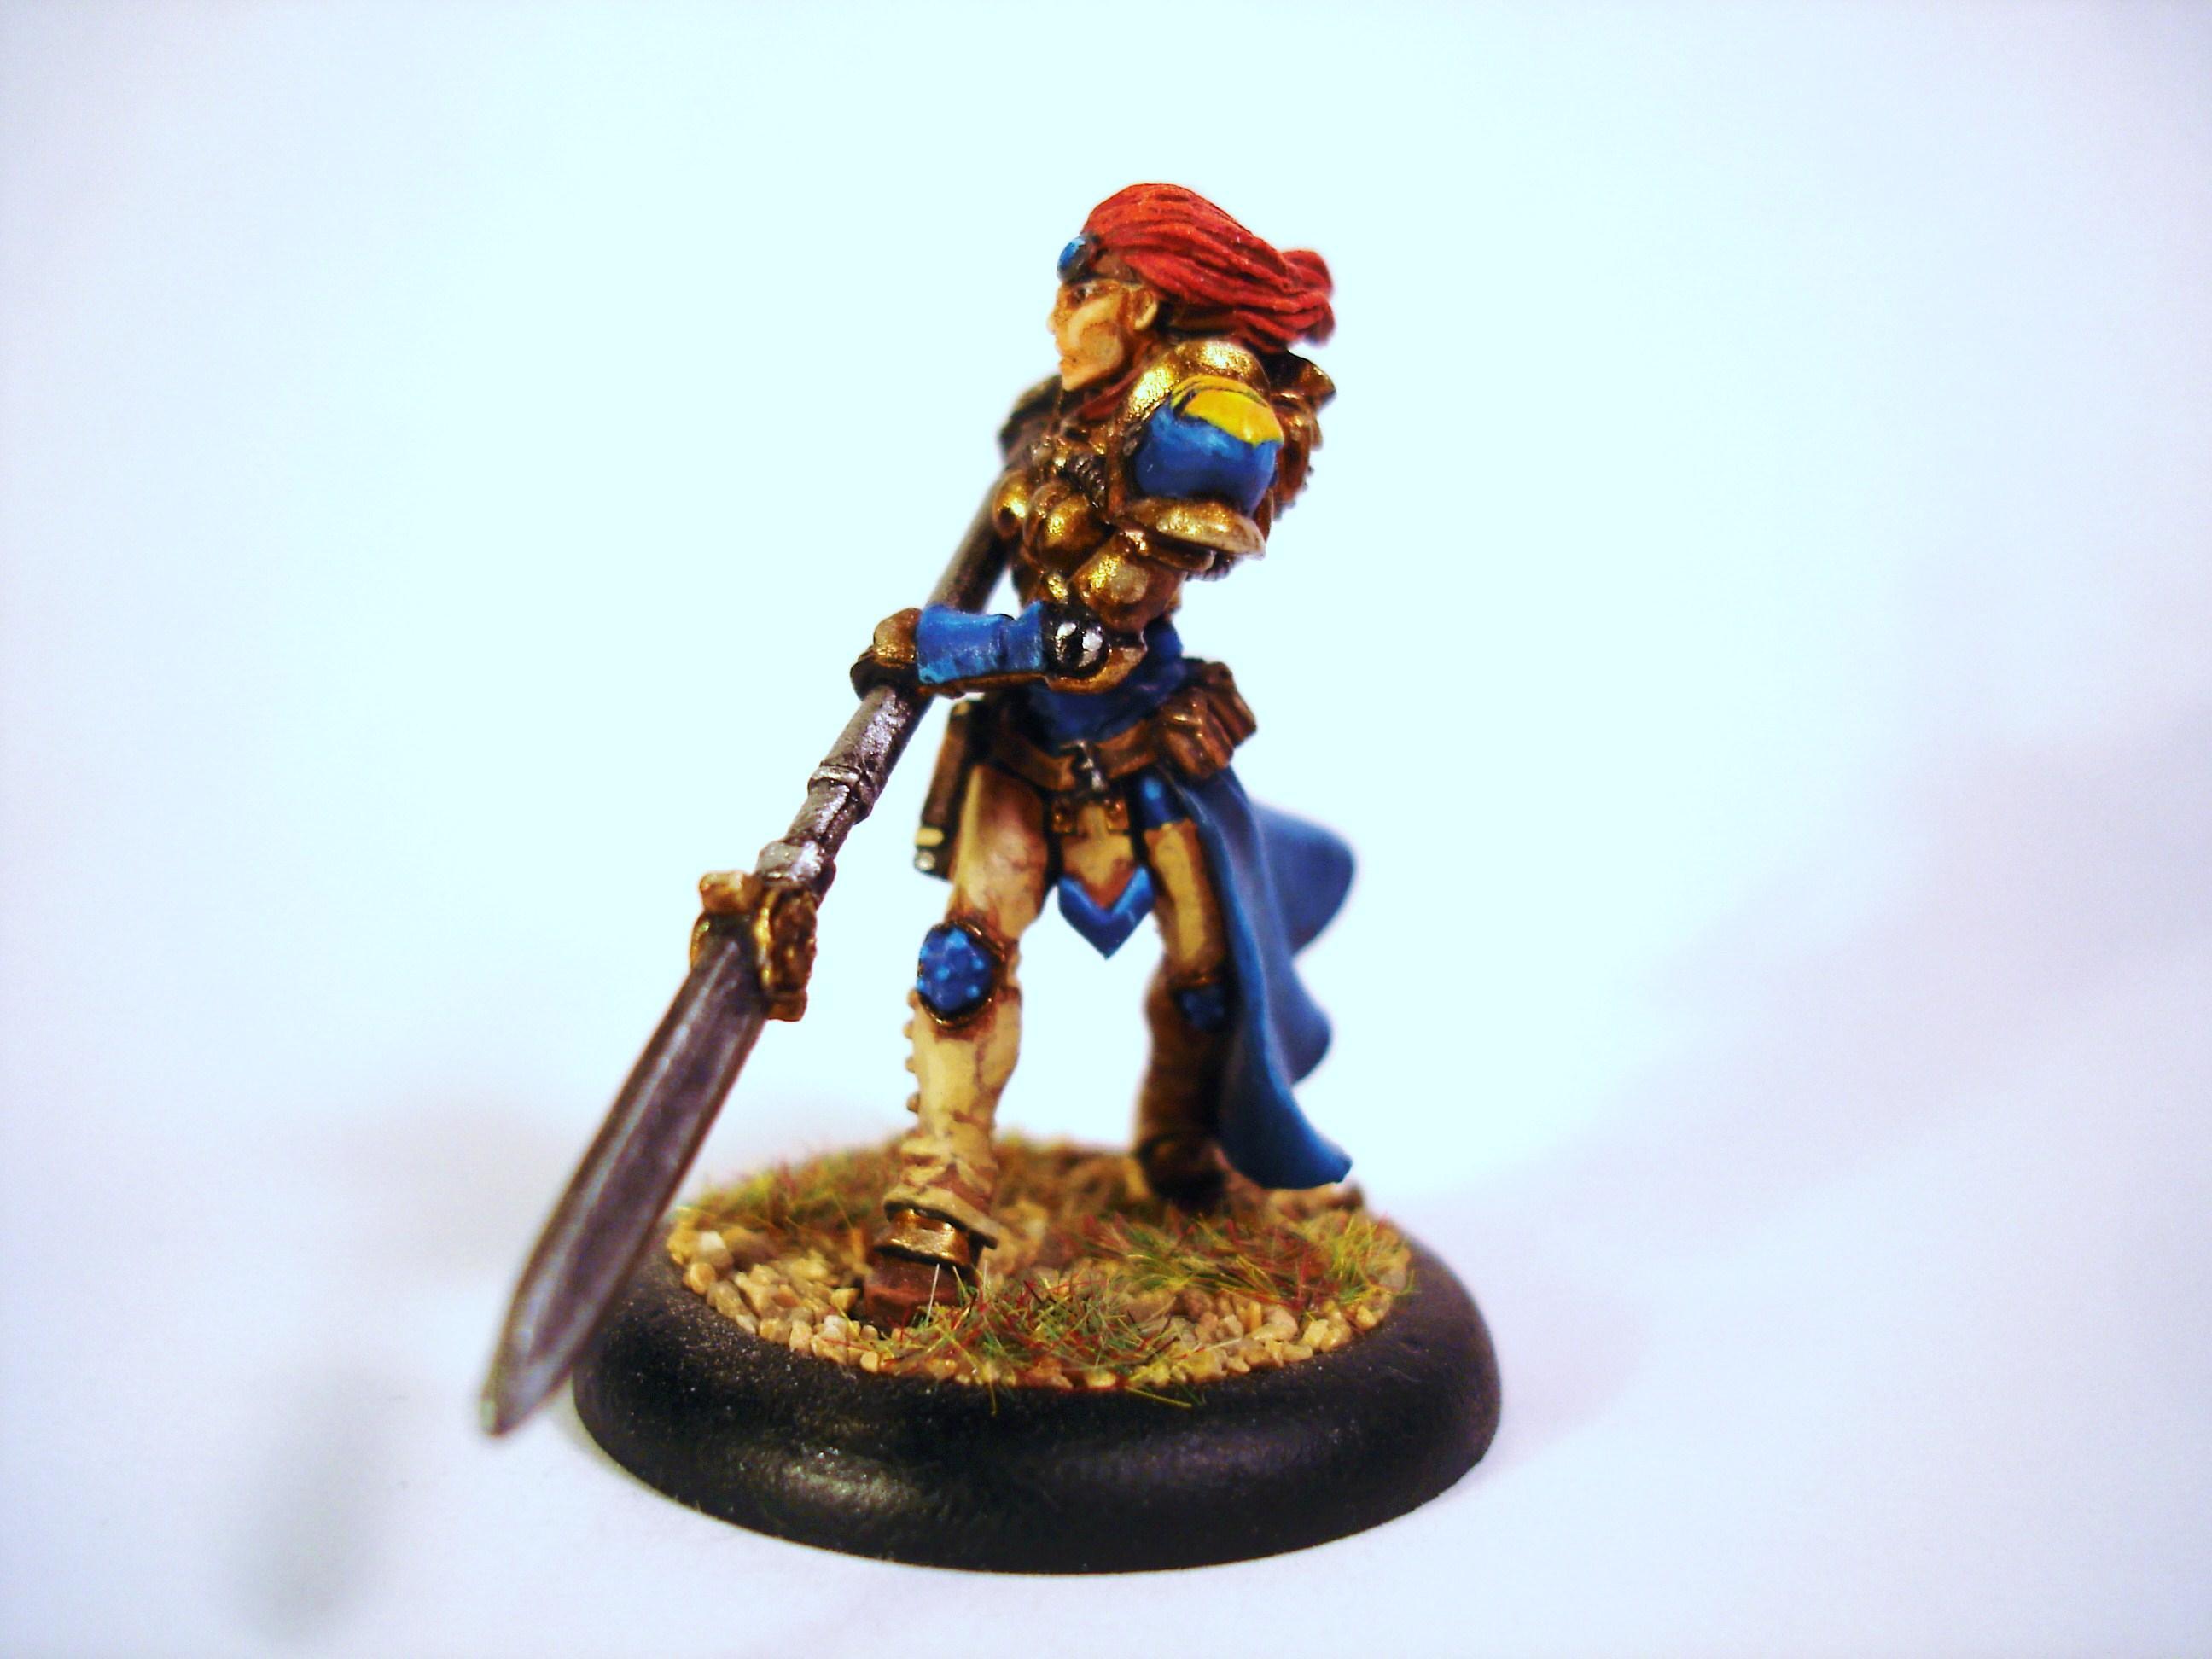 Warmachine, Captain Victoria Haley